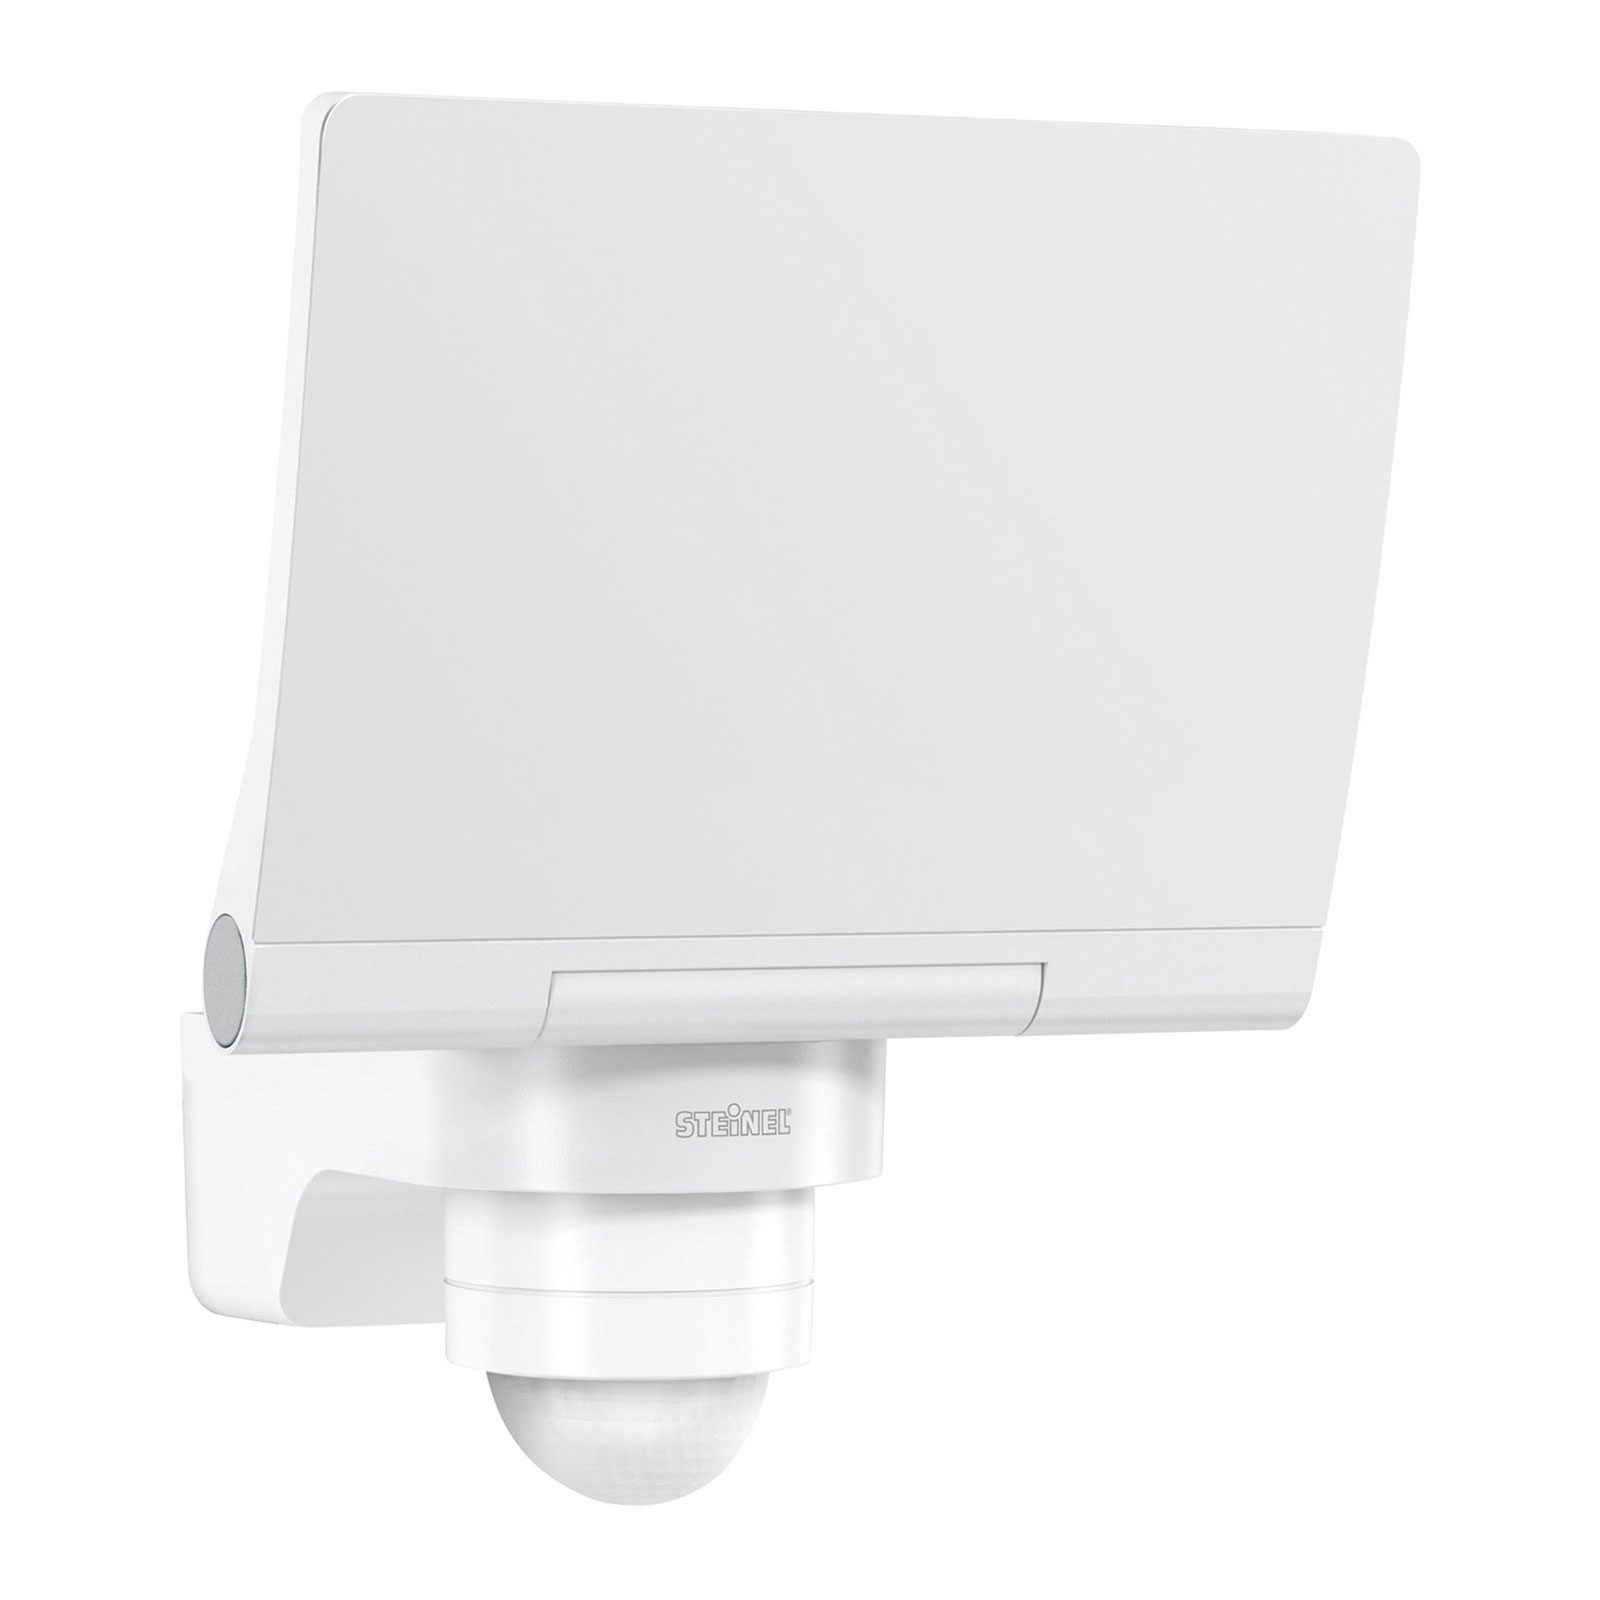 STEINEL XLED Pro 240 sensor-utespot hvit